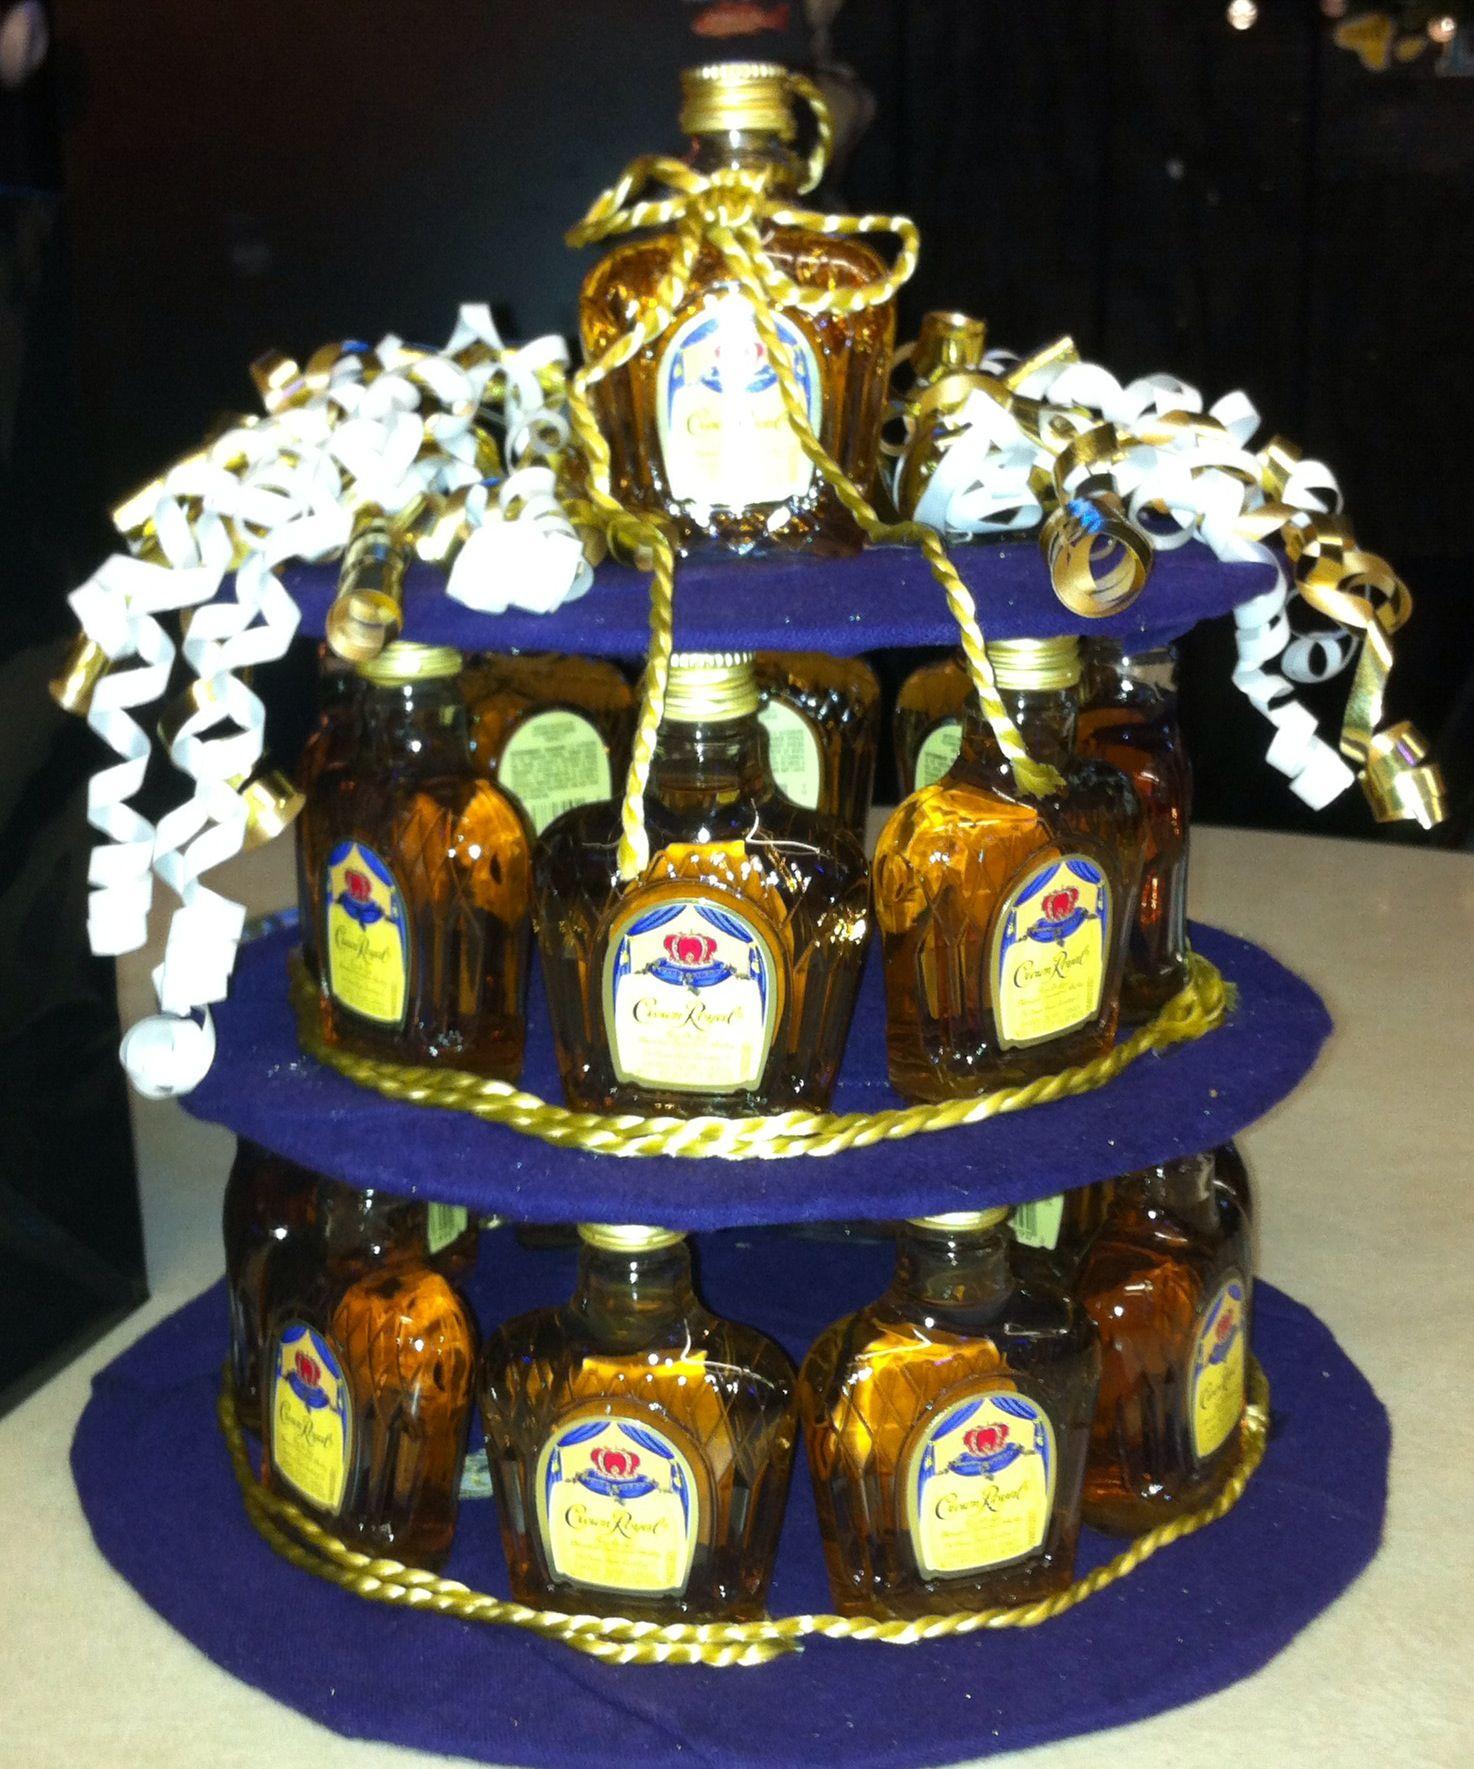 Crown Royal Bottle Birthday Cake